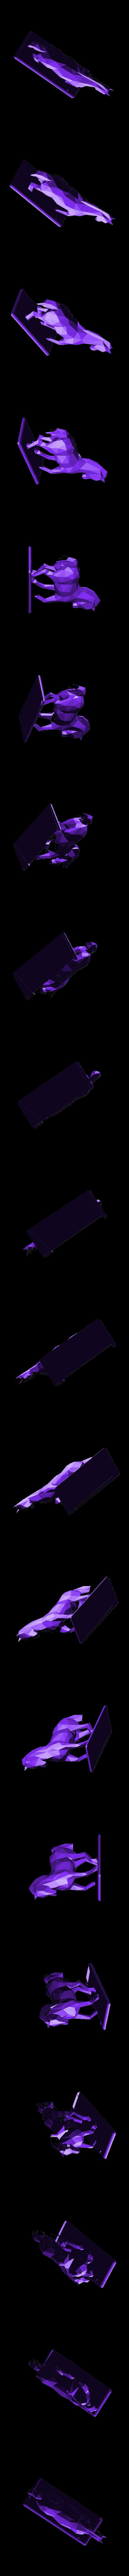 LowPolyHorse.stl Download free STL file LowPolyHorse • Object to 3D print, Digitang3D